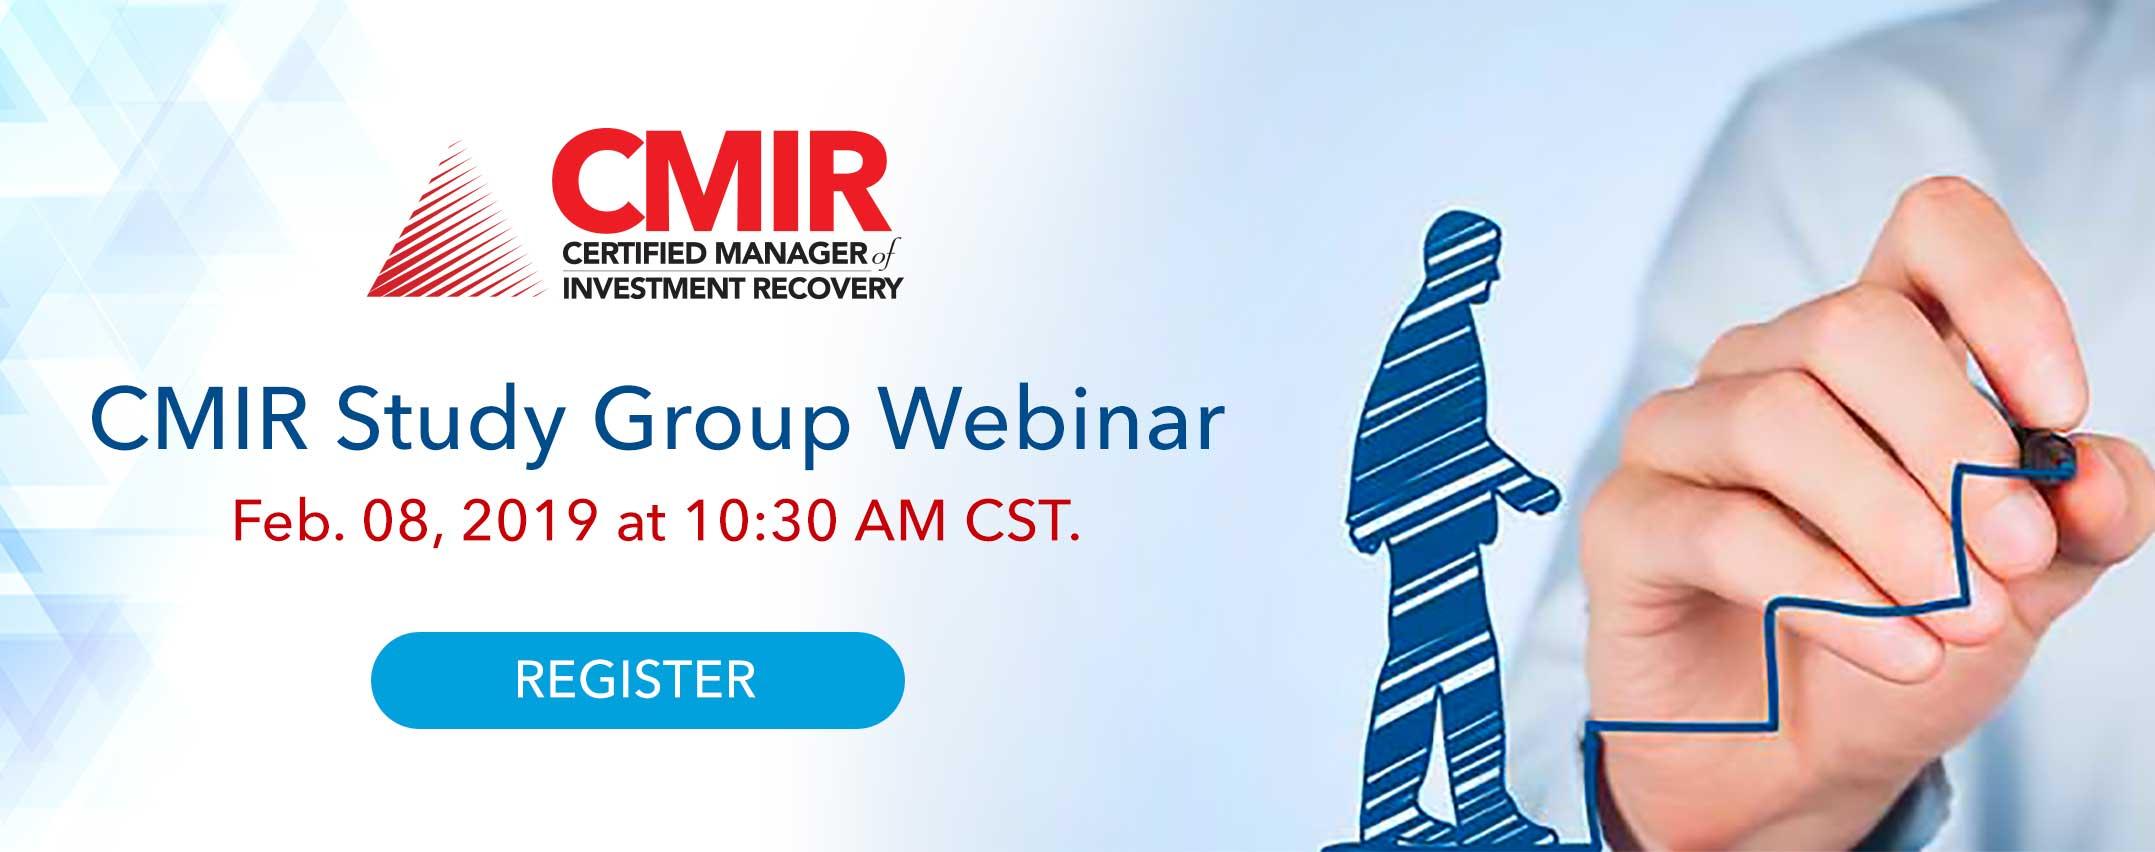 CMIR Study Group webinar